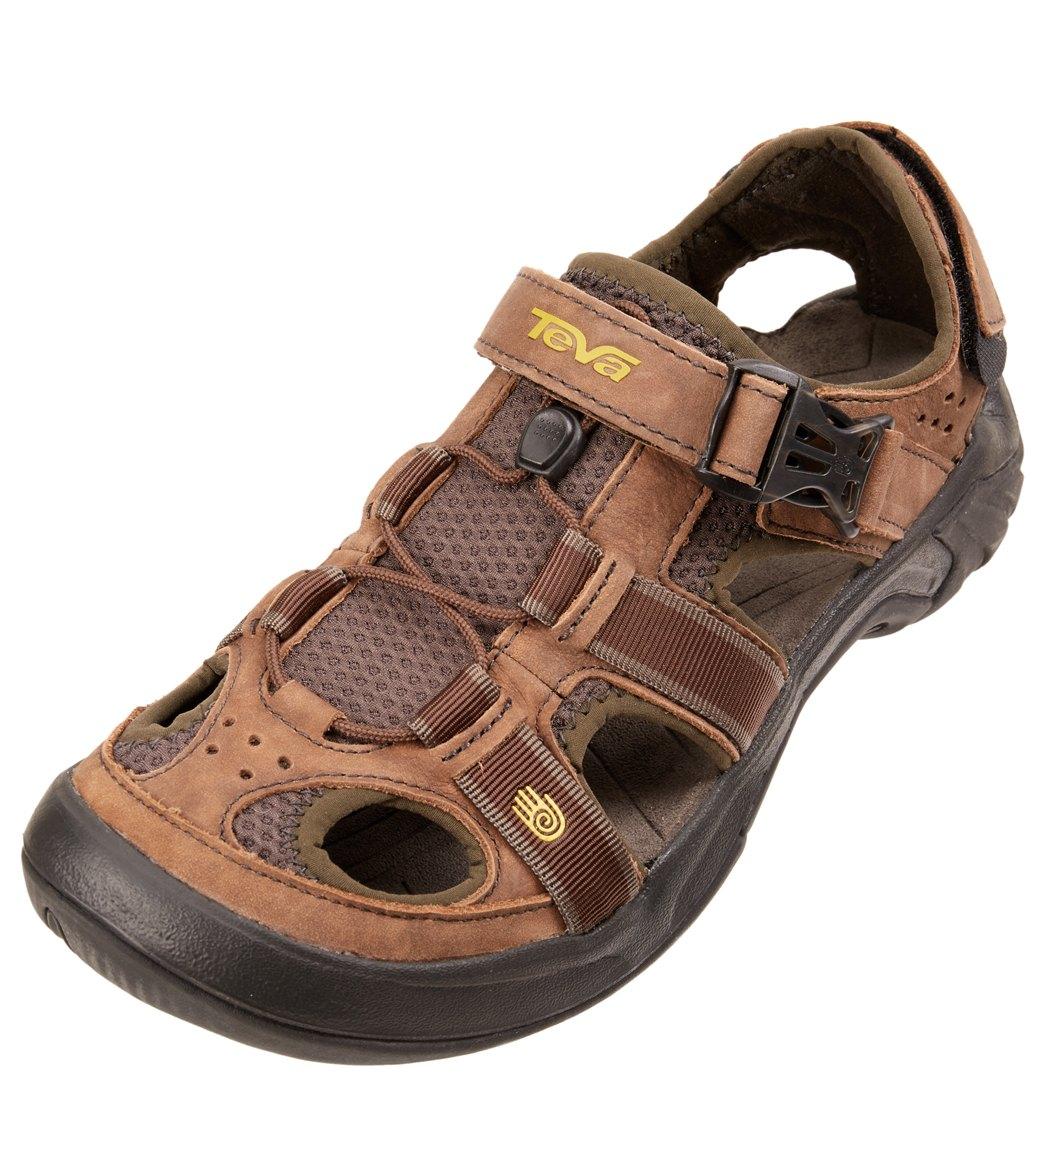 cba705615469 Teva Men s Omnium Leather Water Shoe at SwimOutlet.com - Free ...